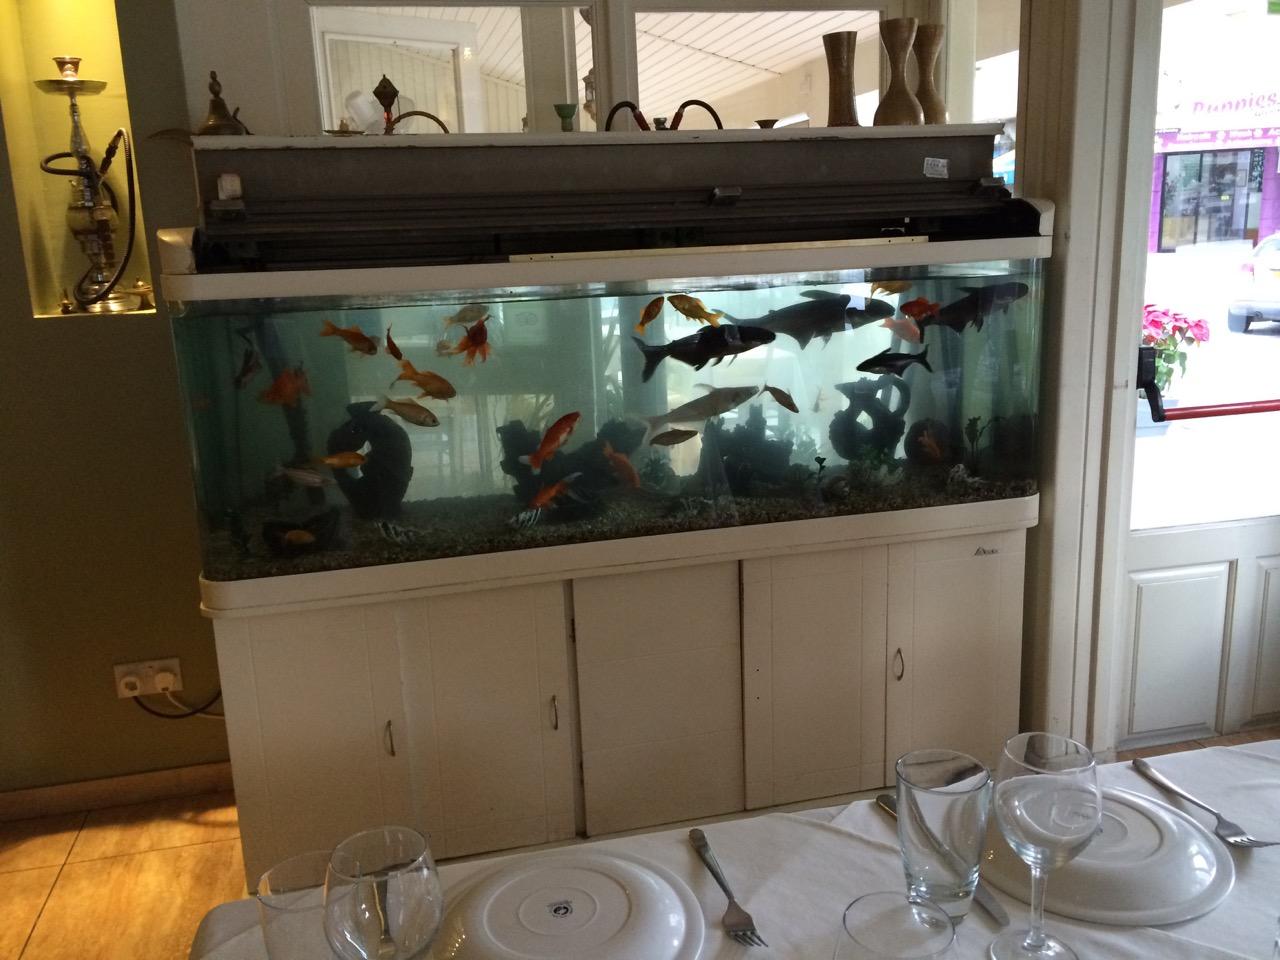 Fishtank with pet fish